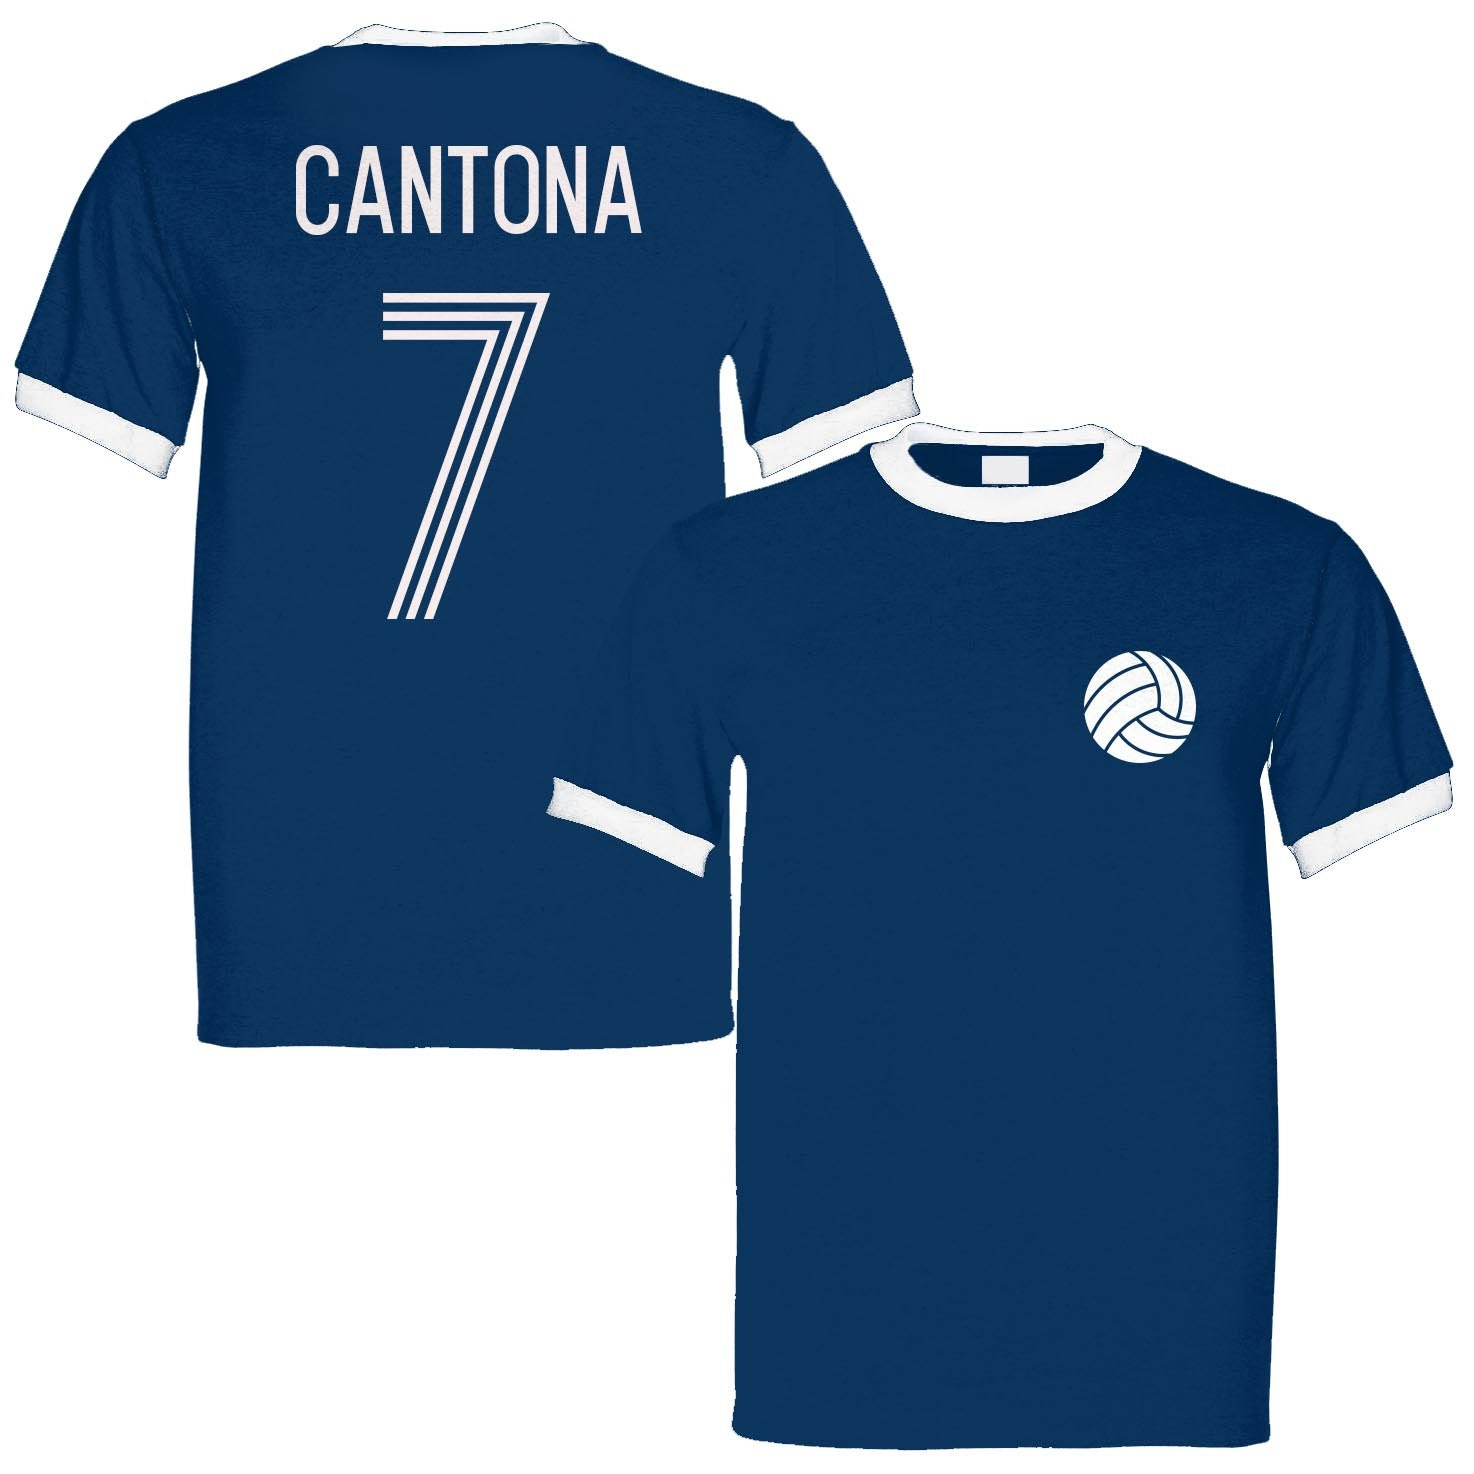 Eric Cantona 7 France Legend Ringer Retro T-shirt Navywhite Unisex Tshirt